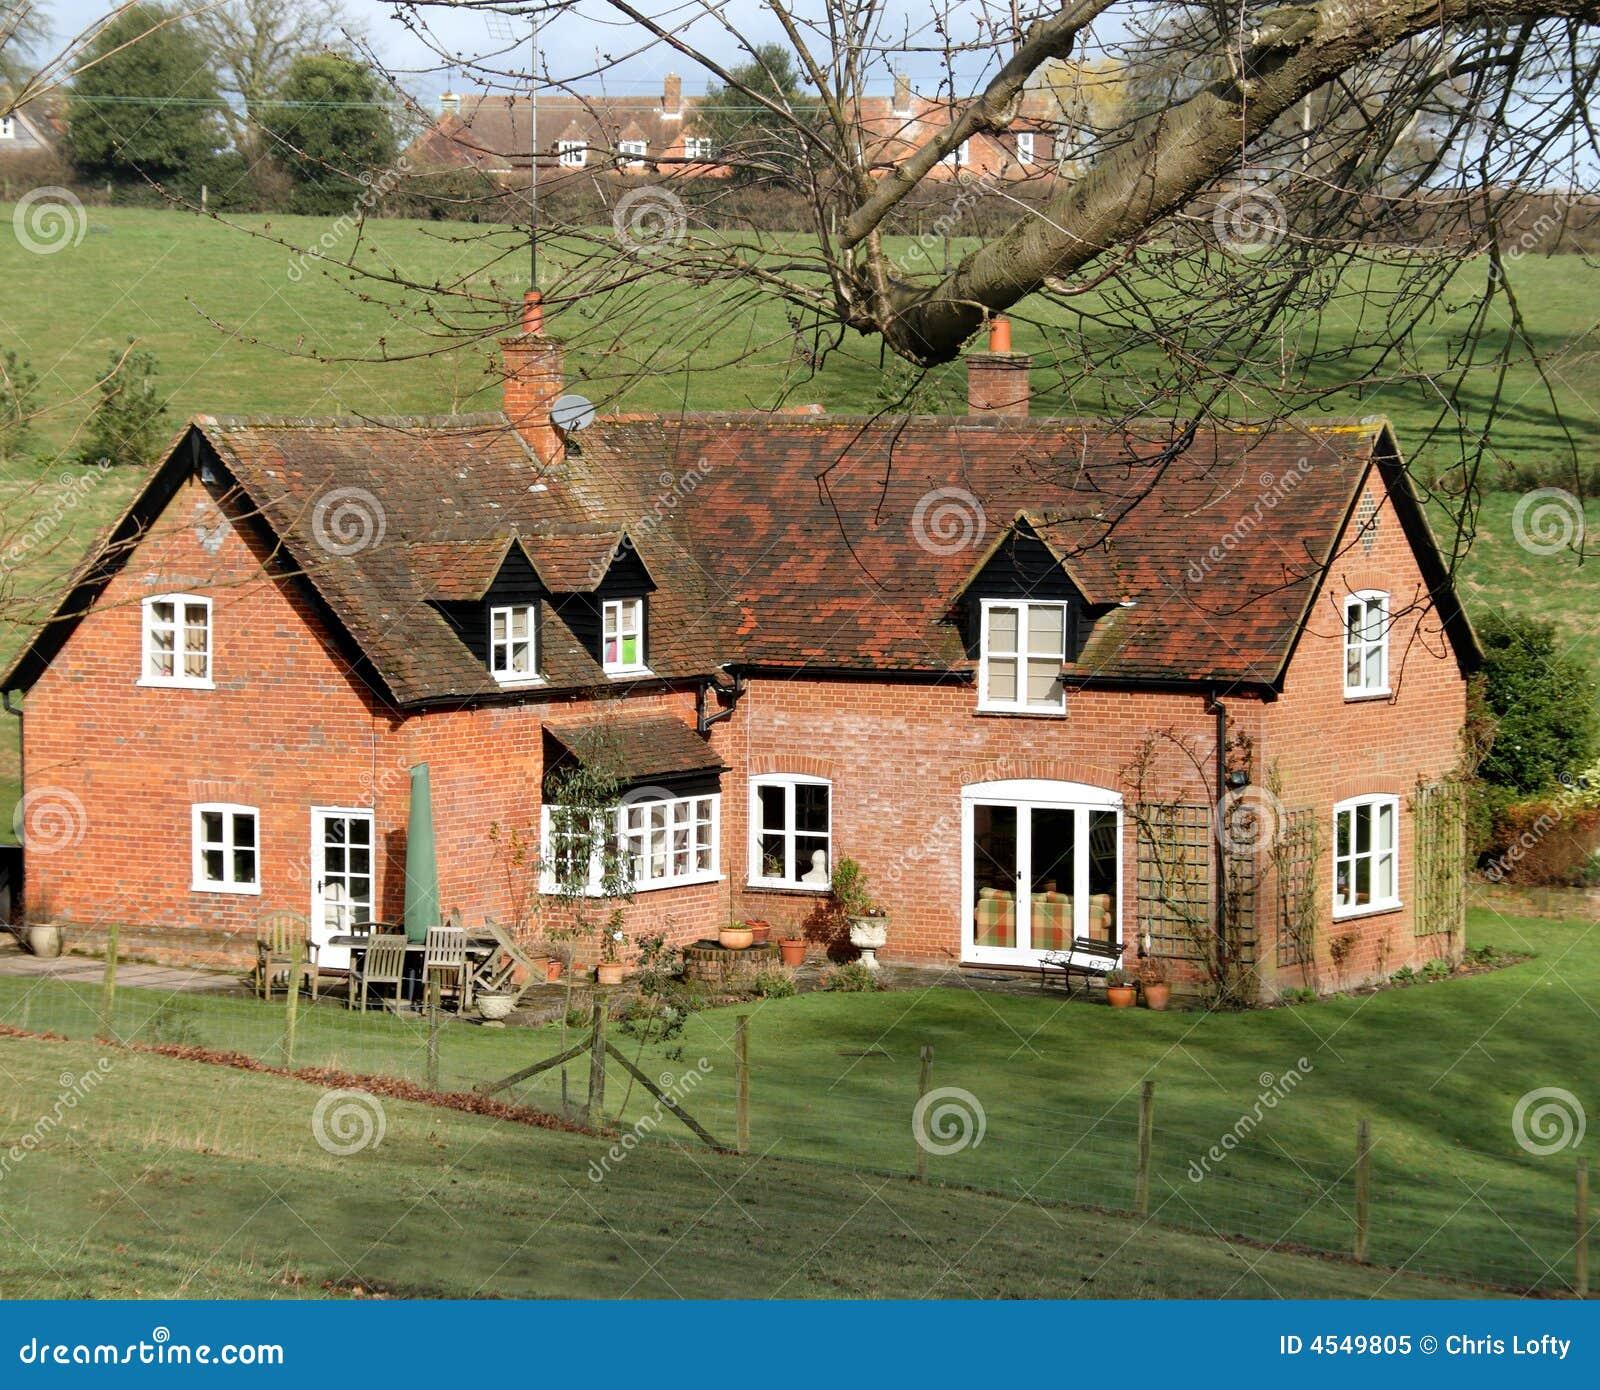 Red Brick English Rural House Royalty Free Stock Photo